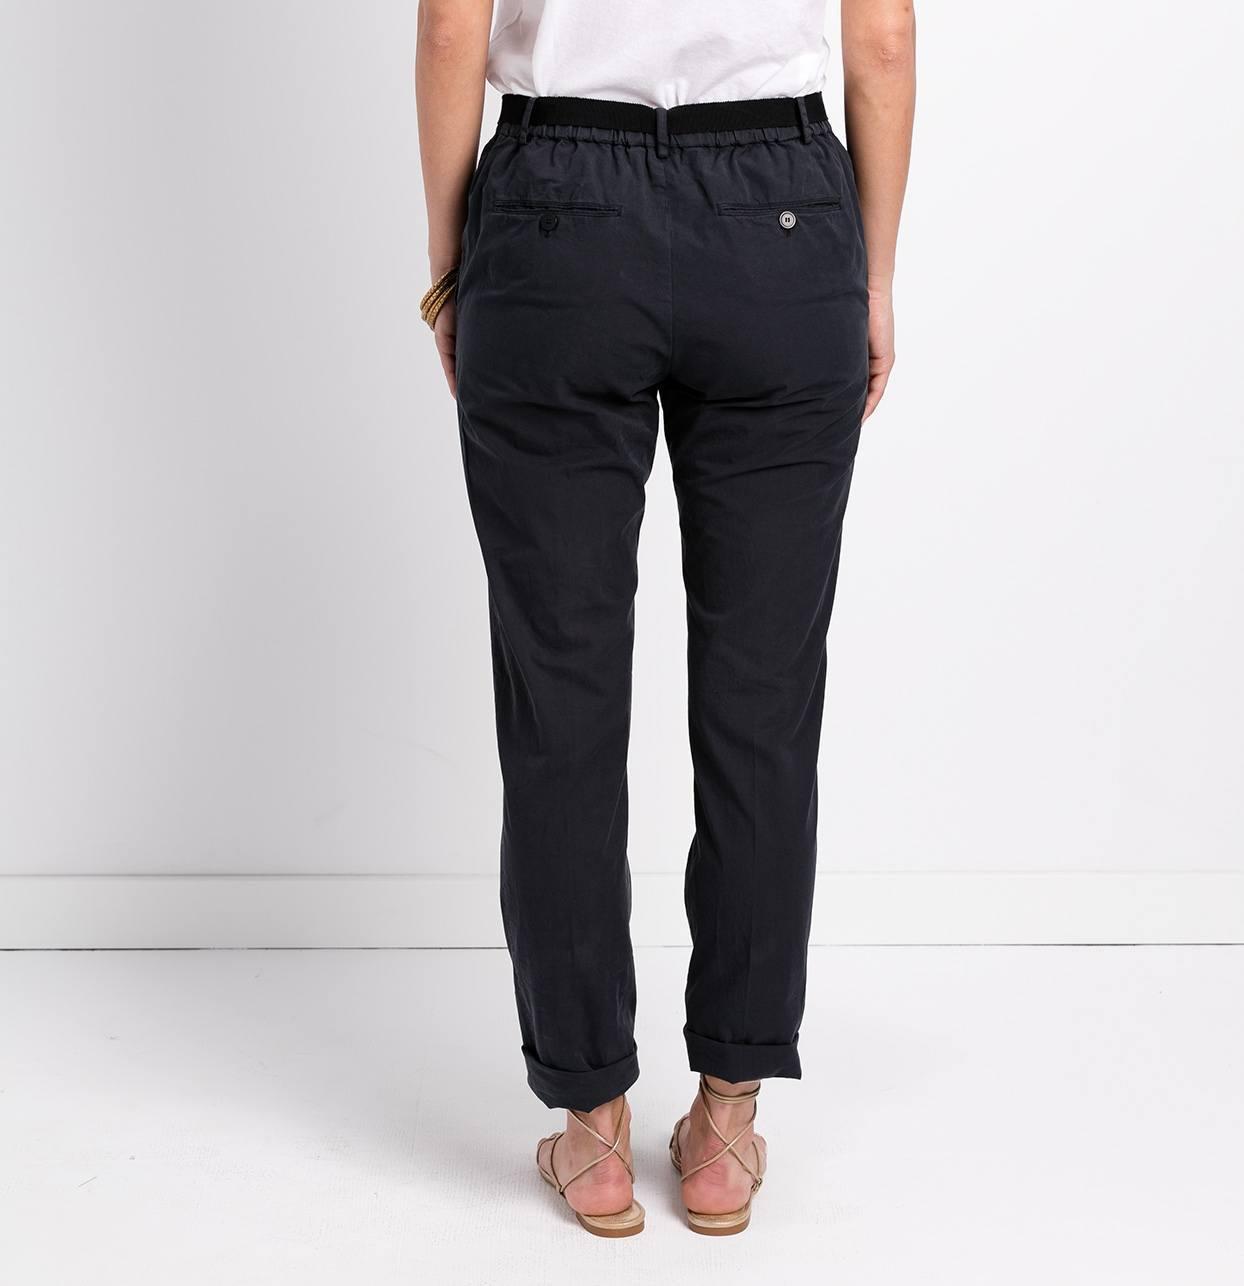 Pantalón soft woman modelo PAPILLON color azul. - Ítem1